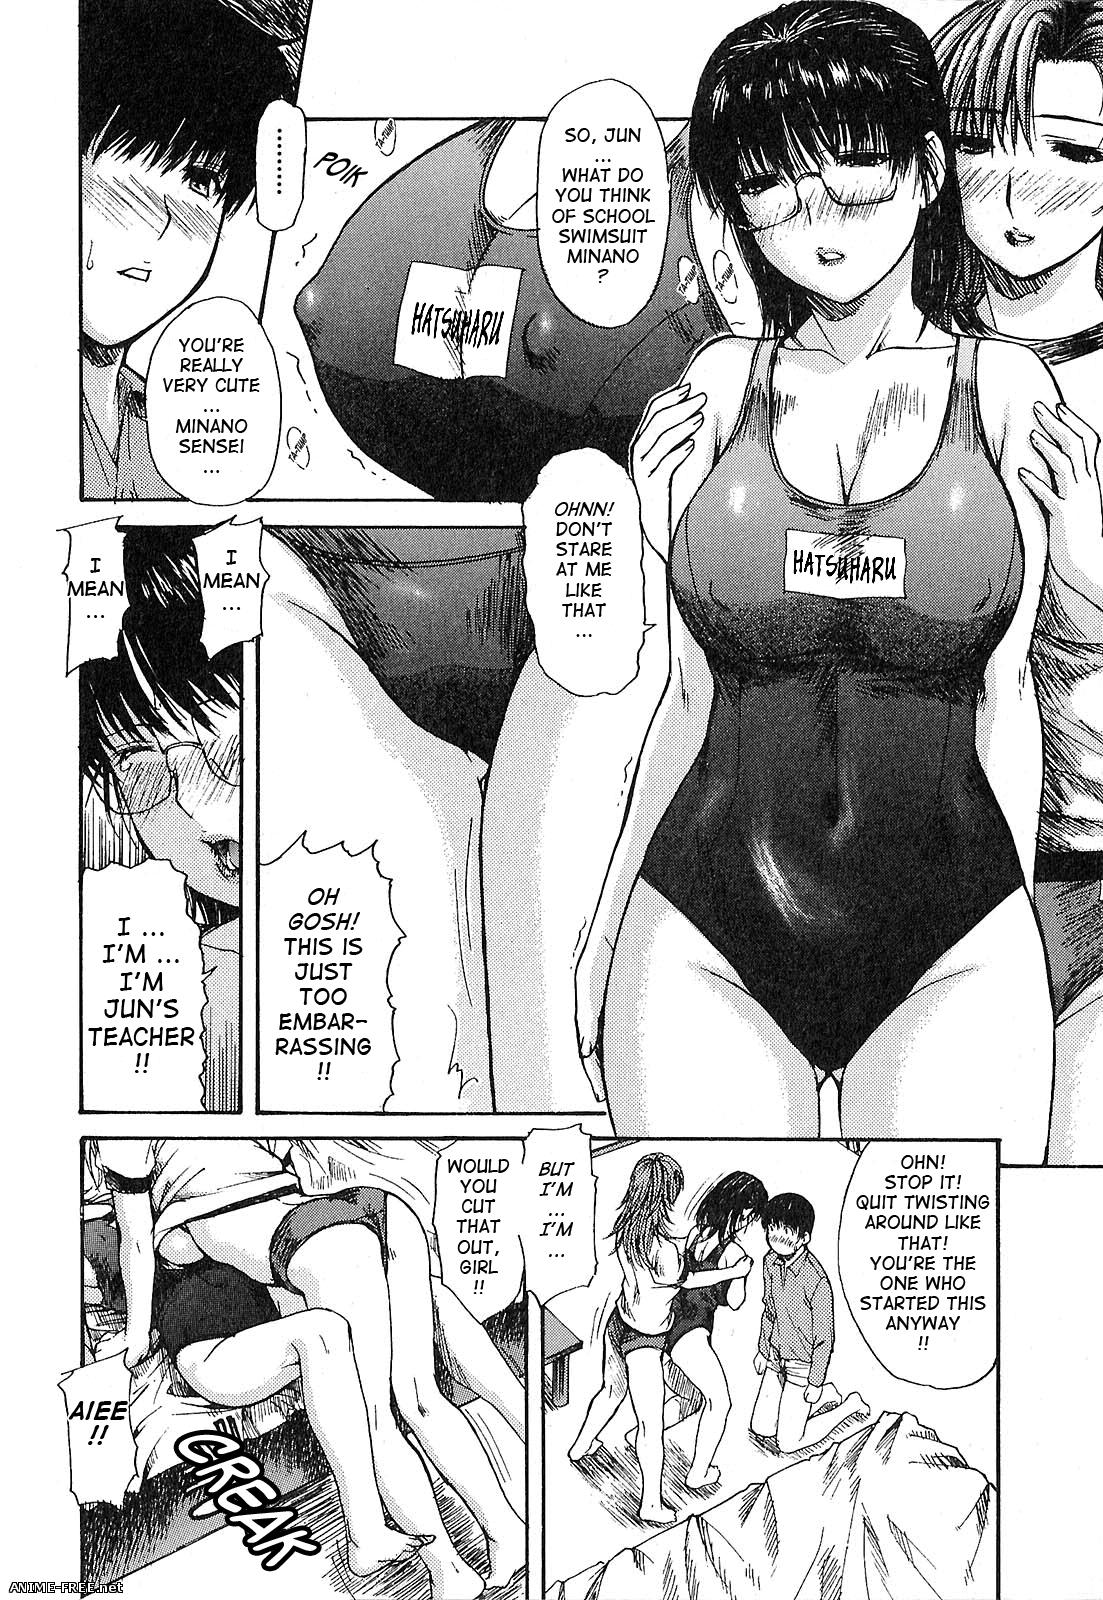 MG JOE (Machine Gun Joe) - Сборник хентай манги [Ptcen] [JAP,RUS,ENG] Manga Hentai